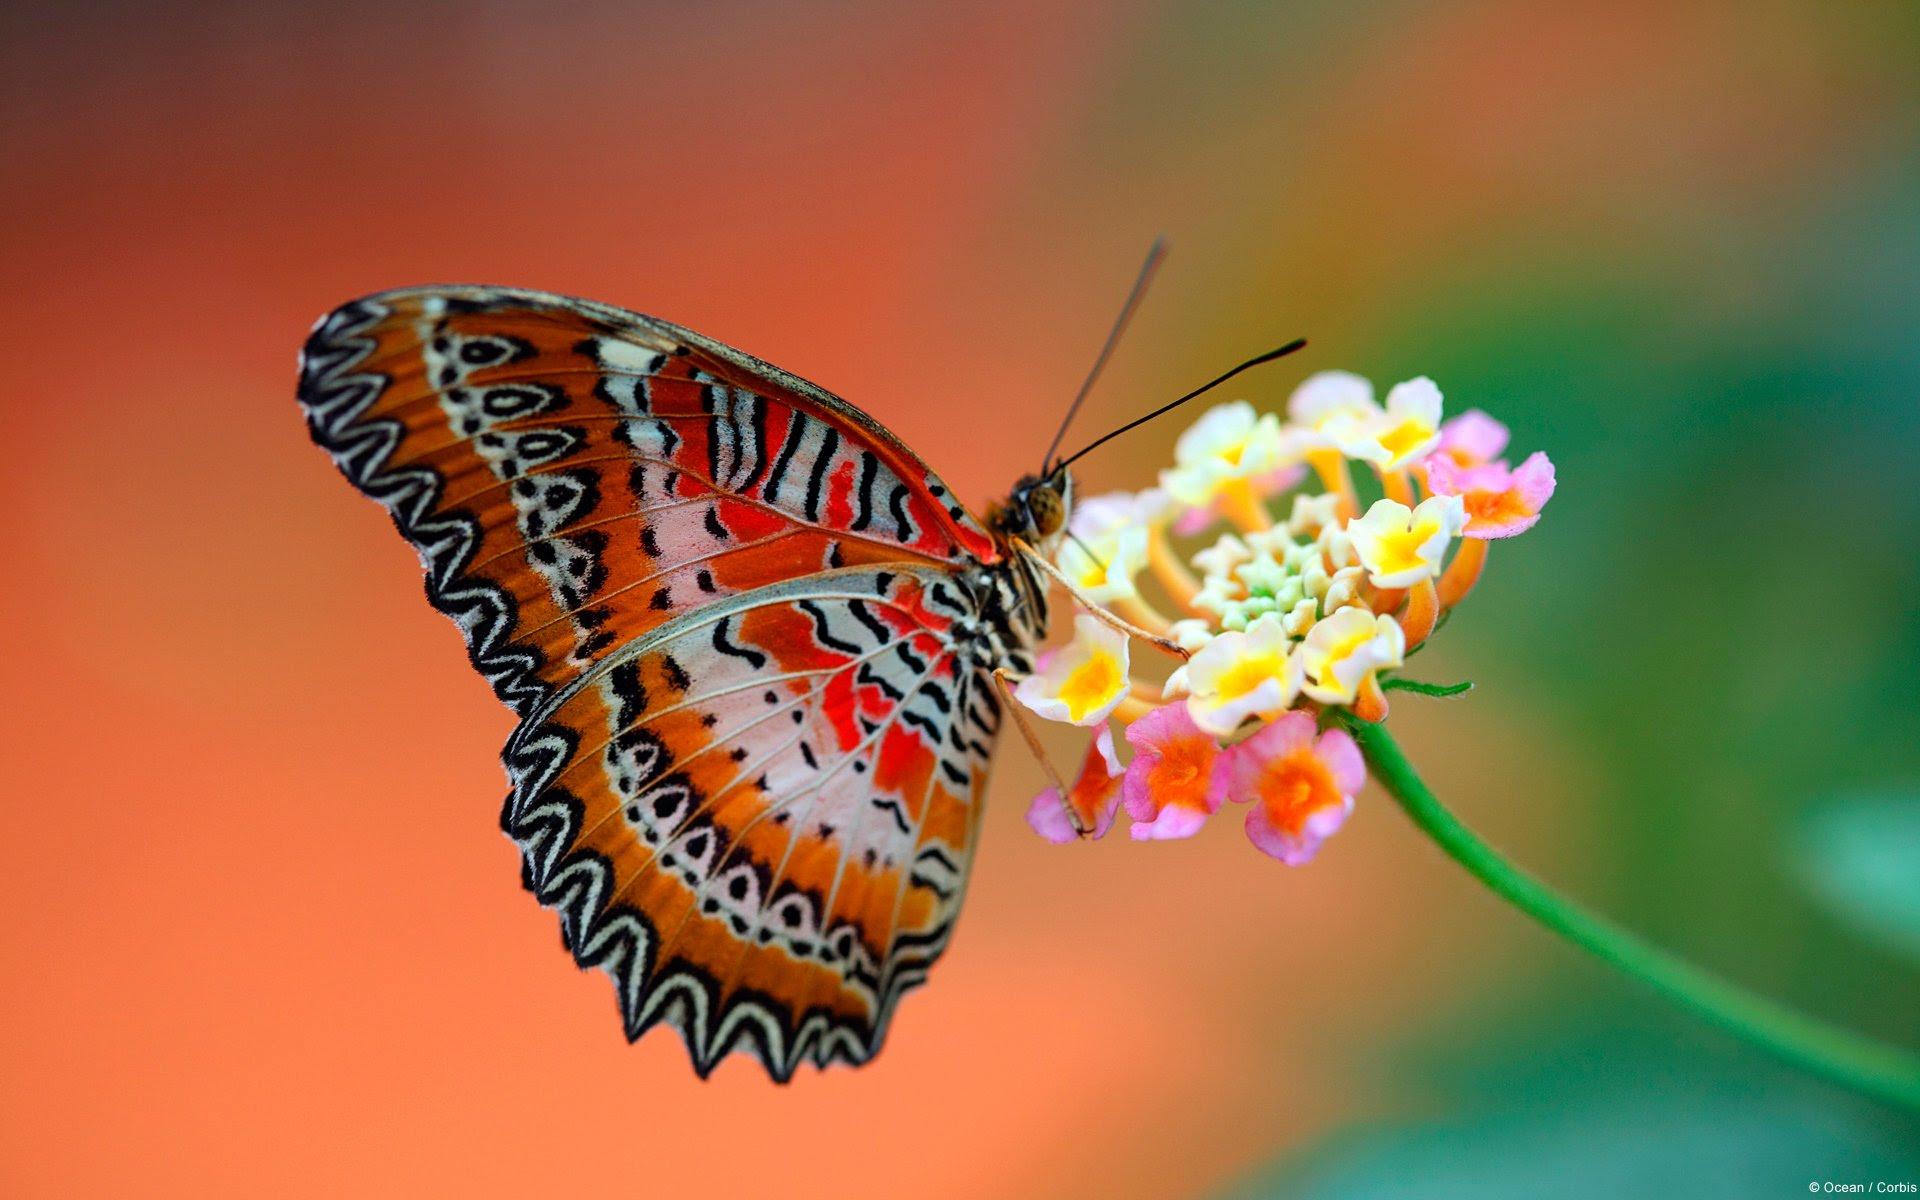 Butterfly and flower wallpaper - SF Wallpaper